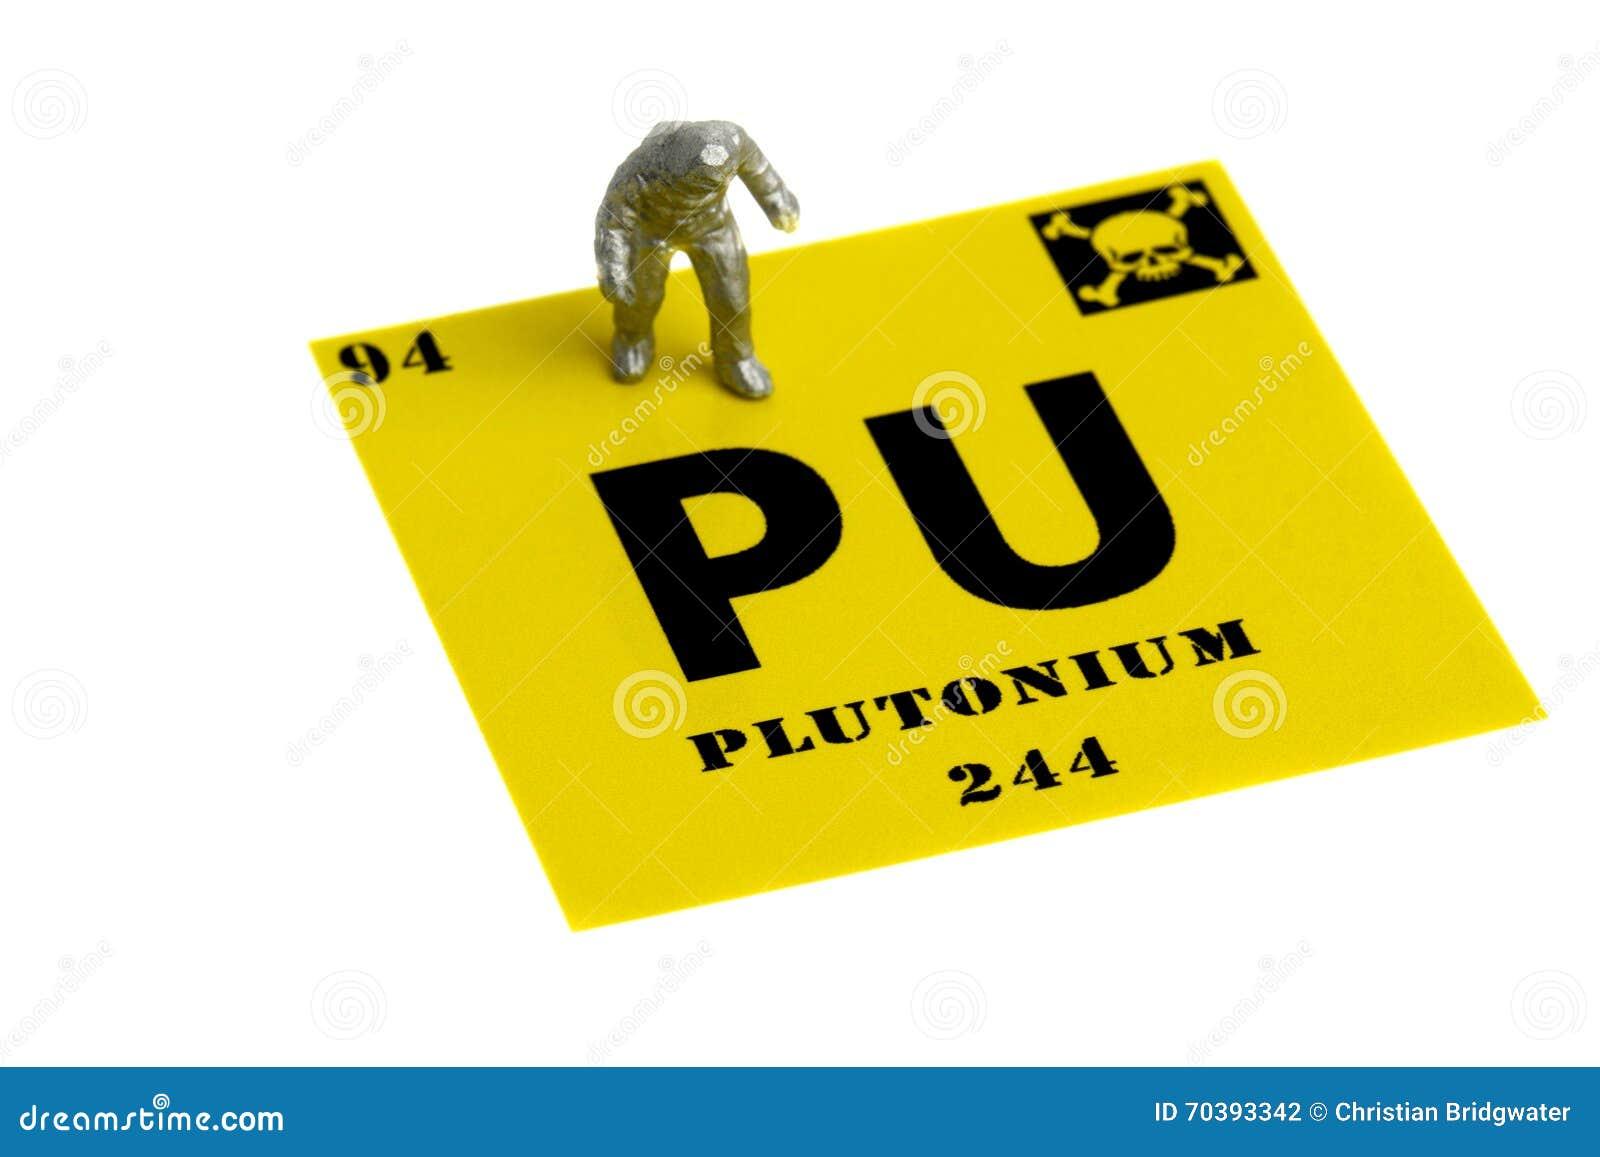 Plutonium Symbol Miniature Man Chemical Suit Stock Photo Image Of